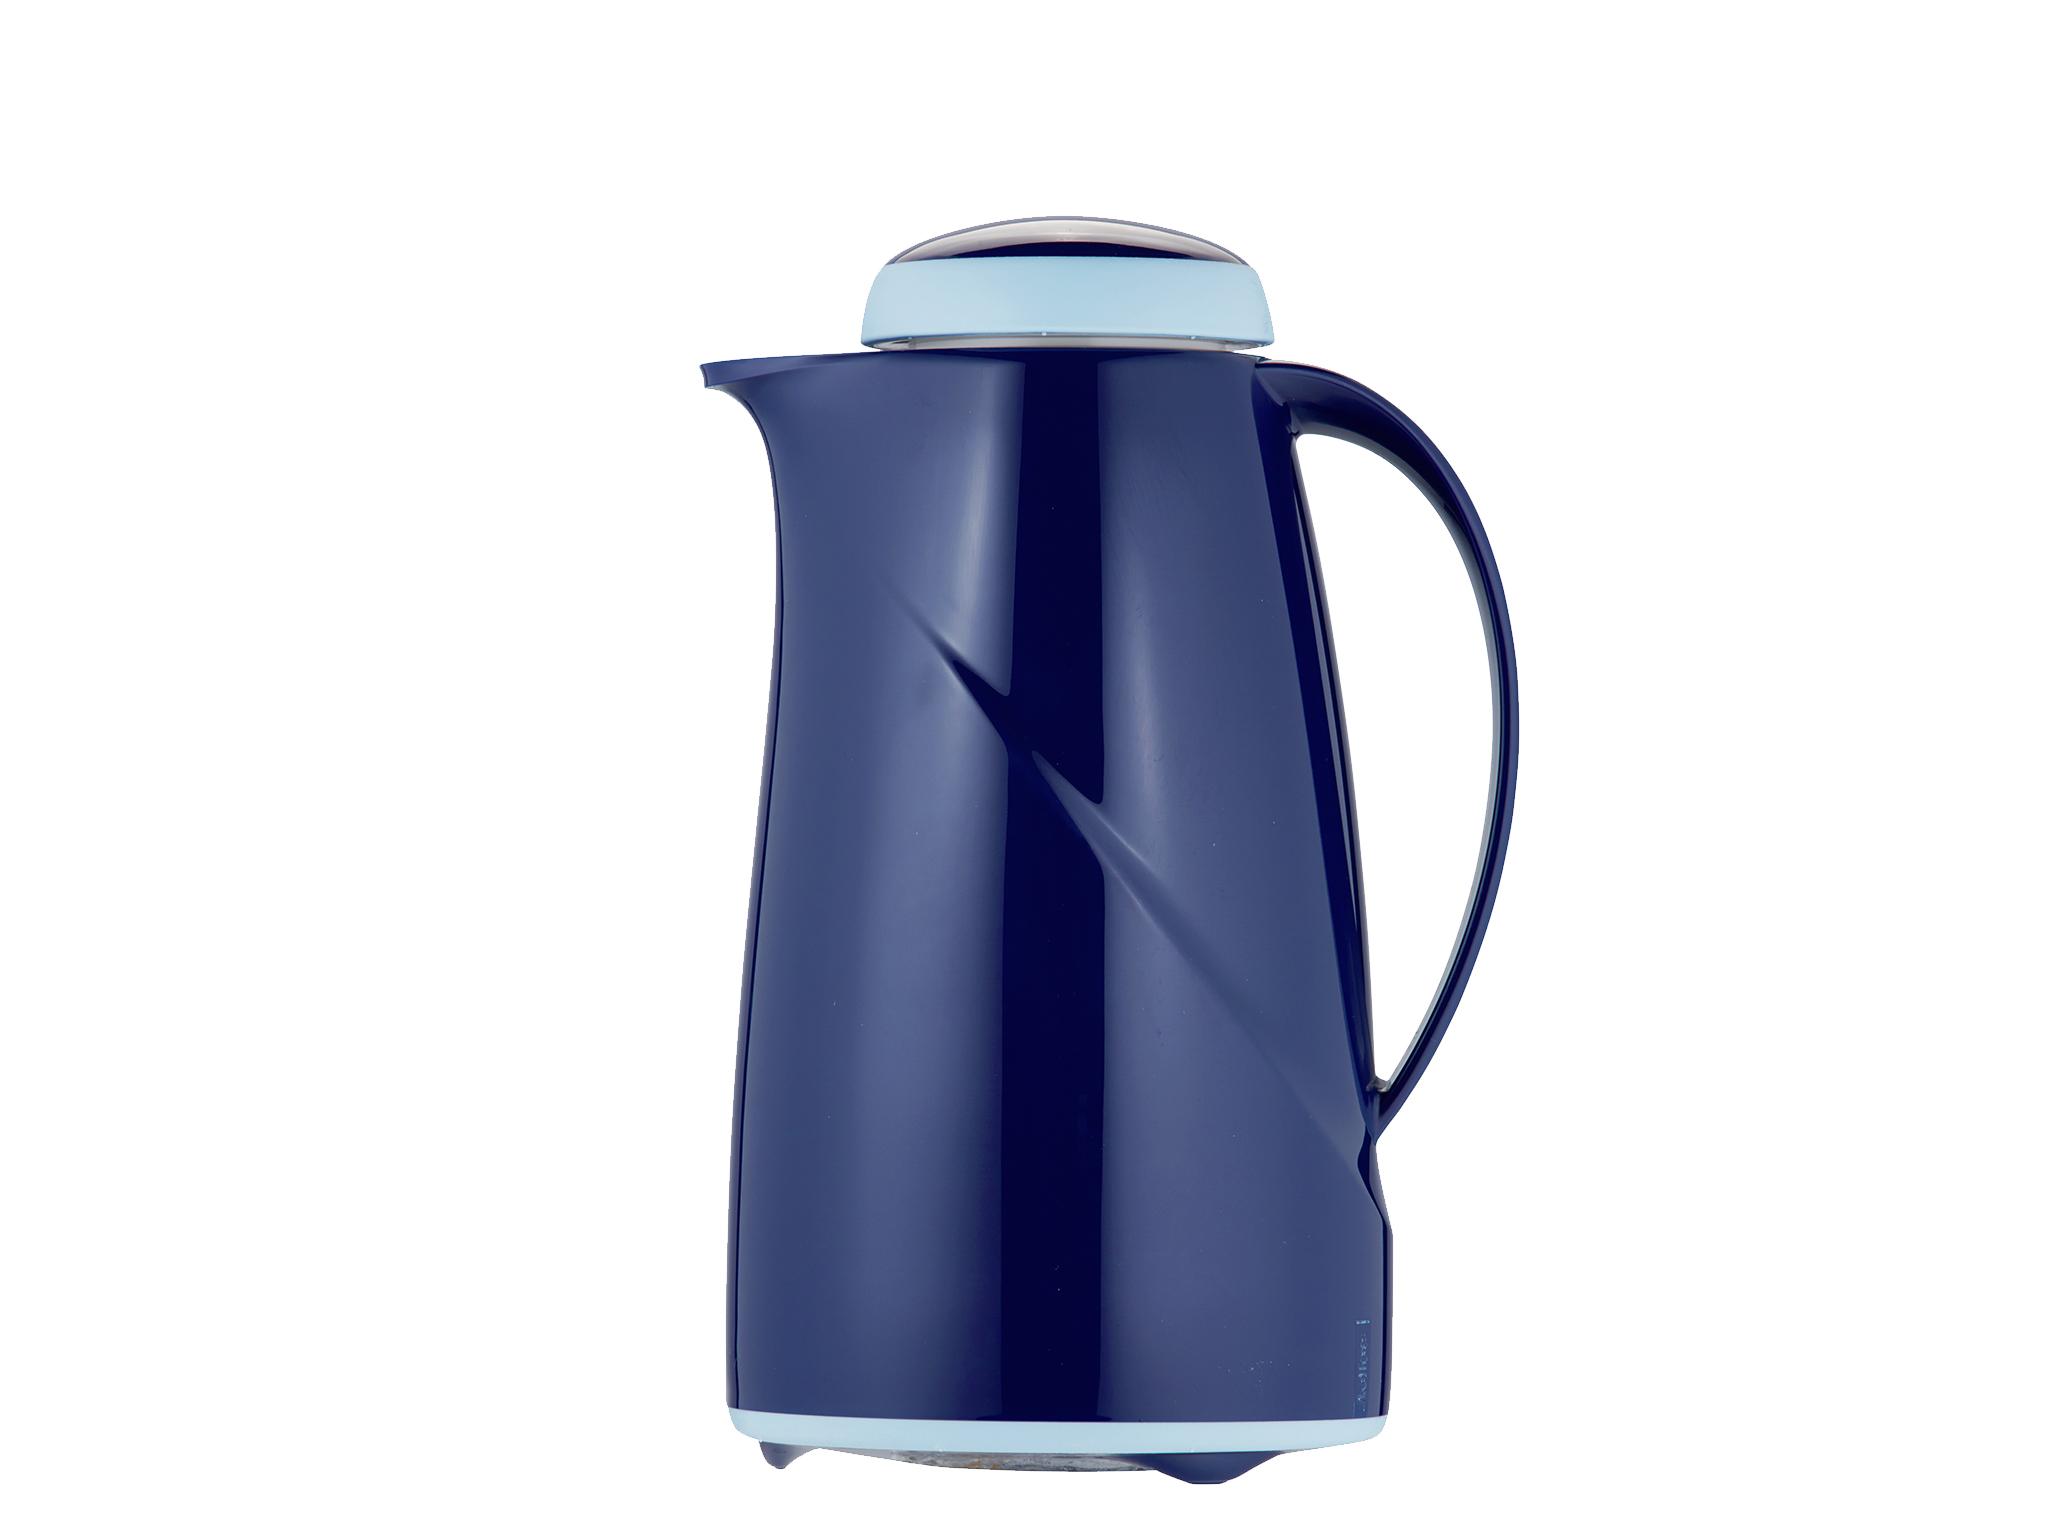 2964-008 - Vacuum carafe unbreakable blue 1.0 L WAVE S+ - Helios